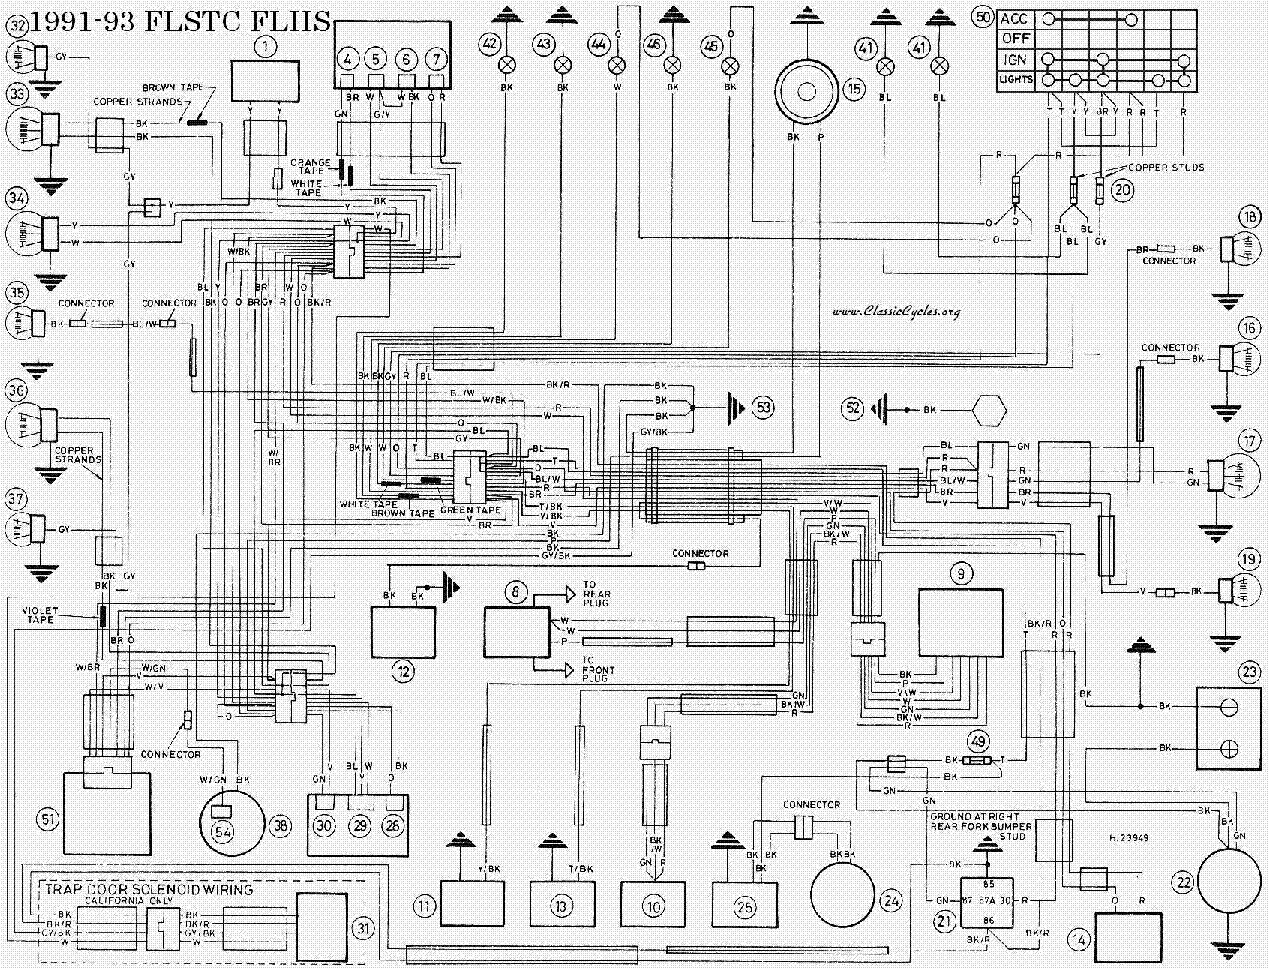 2005 harley davidson softail wiring diagram viper 350 hv engine geen ortholinc de 1991 93 flstc flhs service manual rh pinterest com